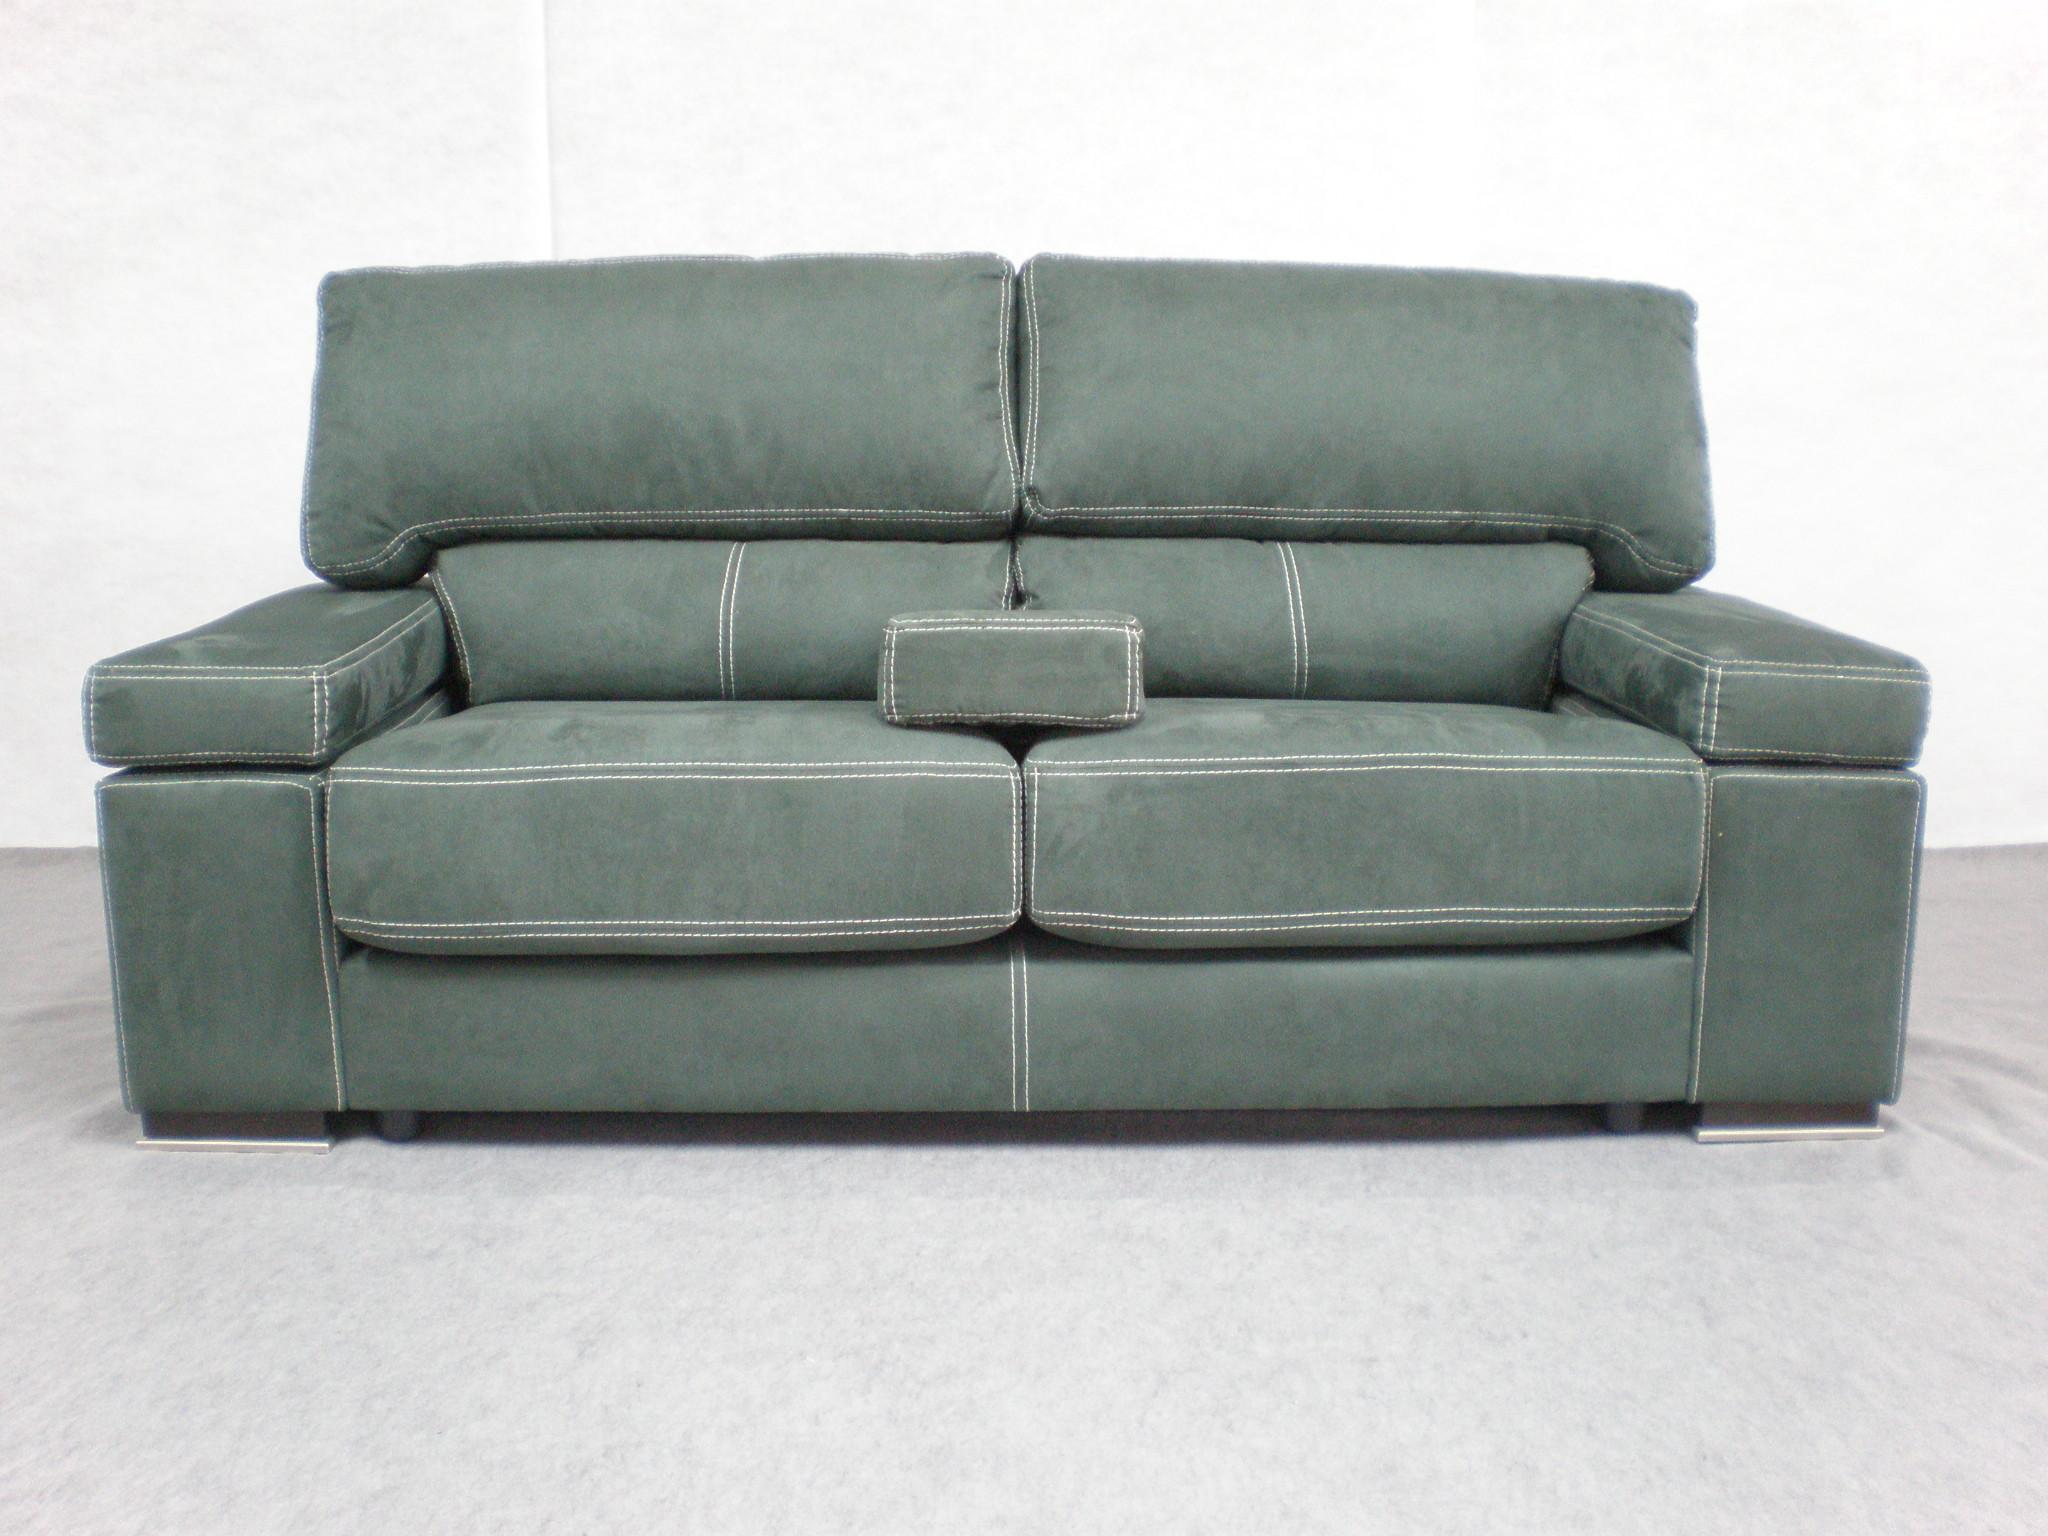 Sharon el m s vendido for Liquidacion sofas